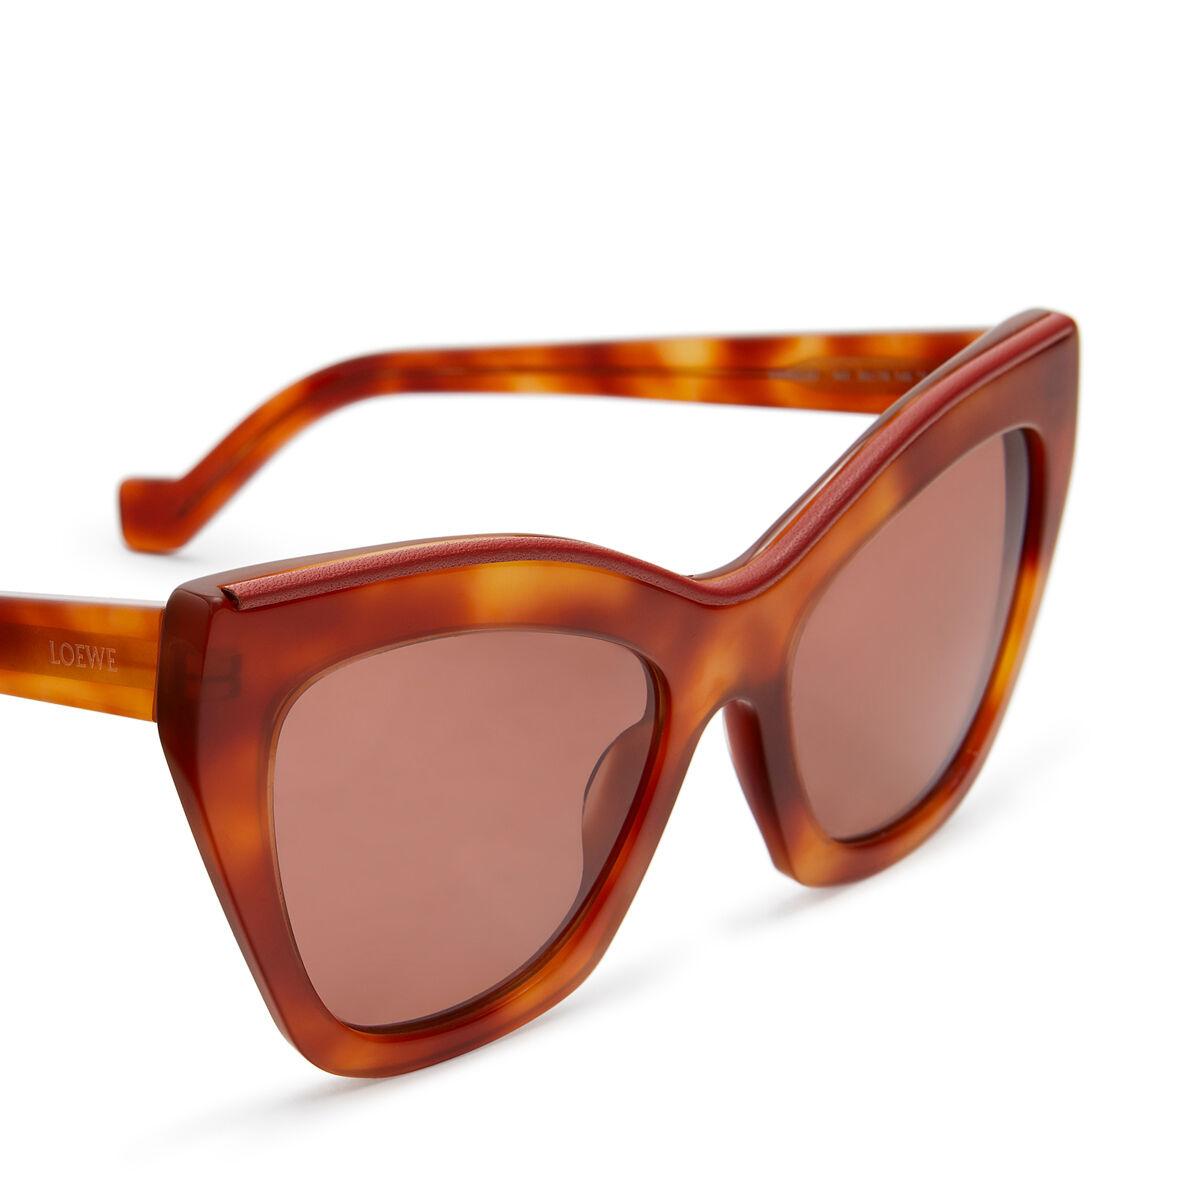 LOEWE Gafas Cateye Amarillo Vintage/Rojo/M Solido front